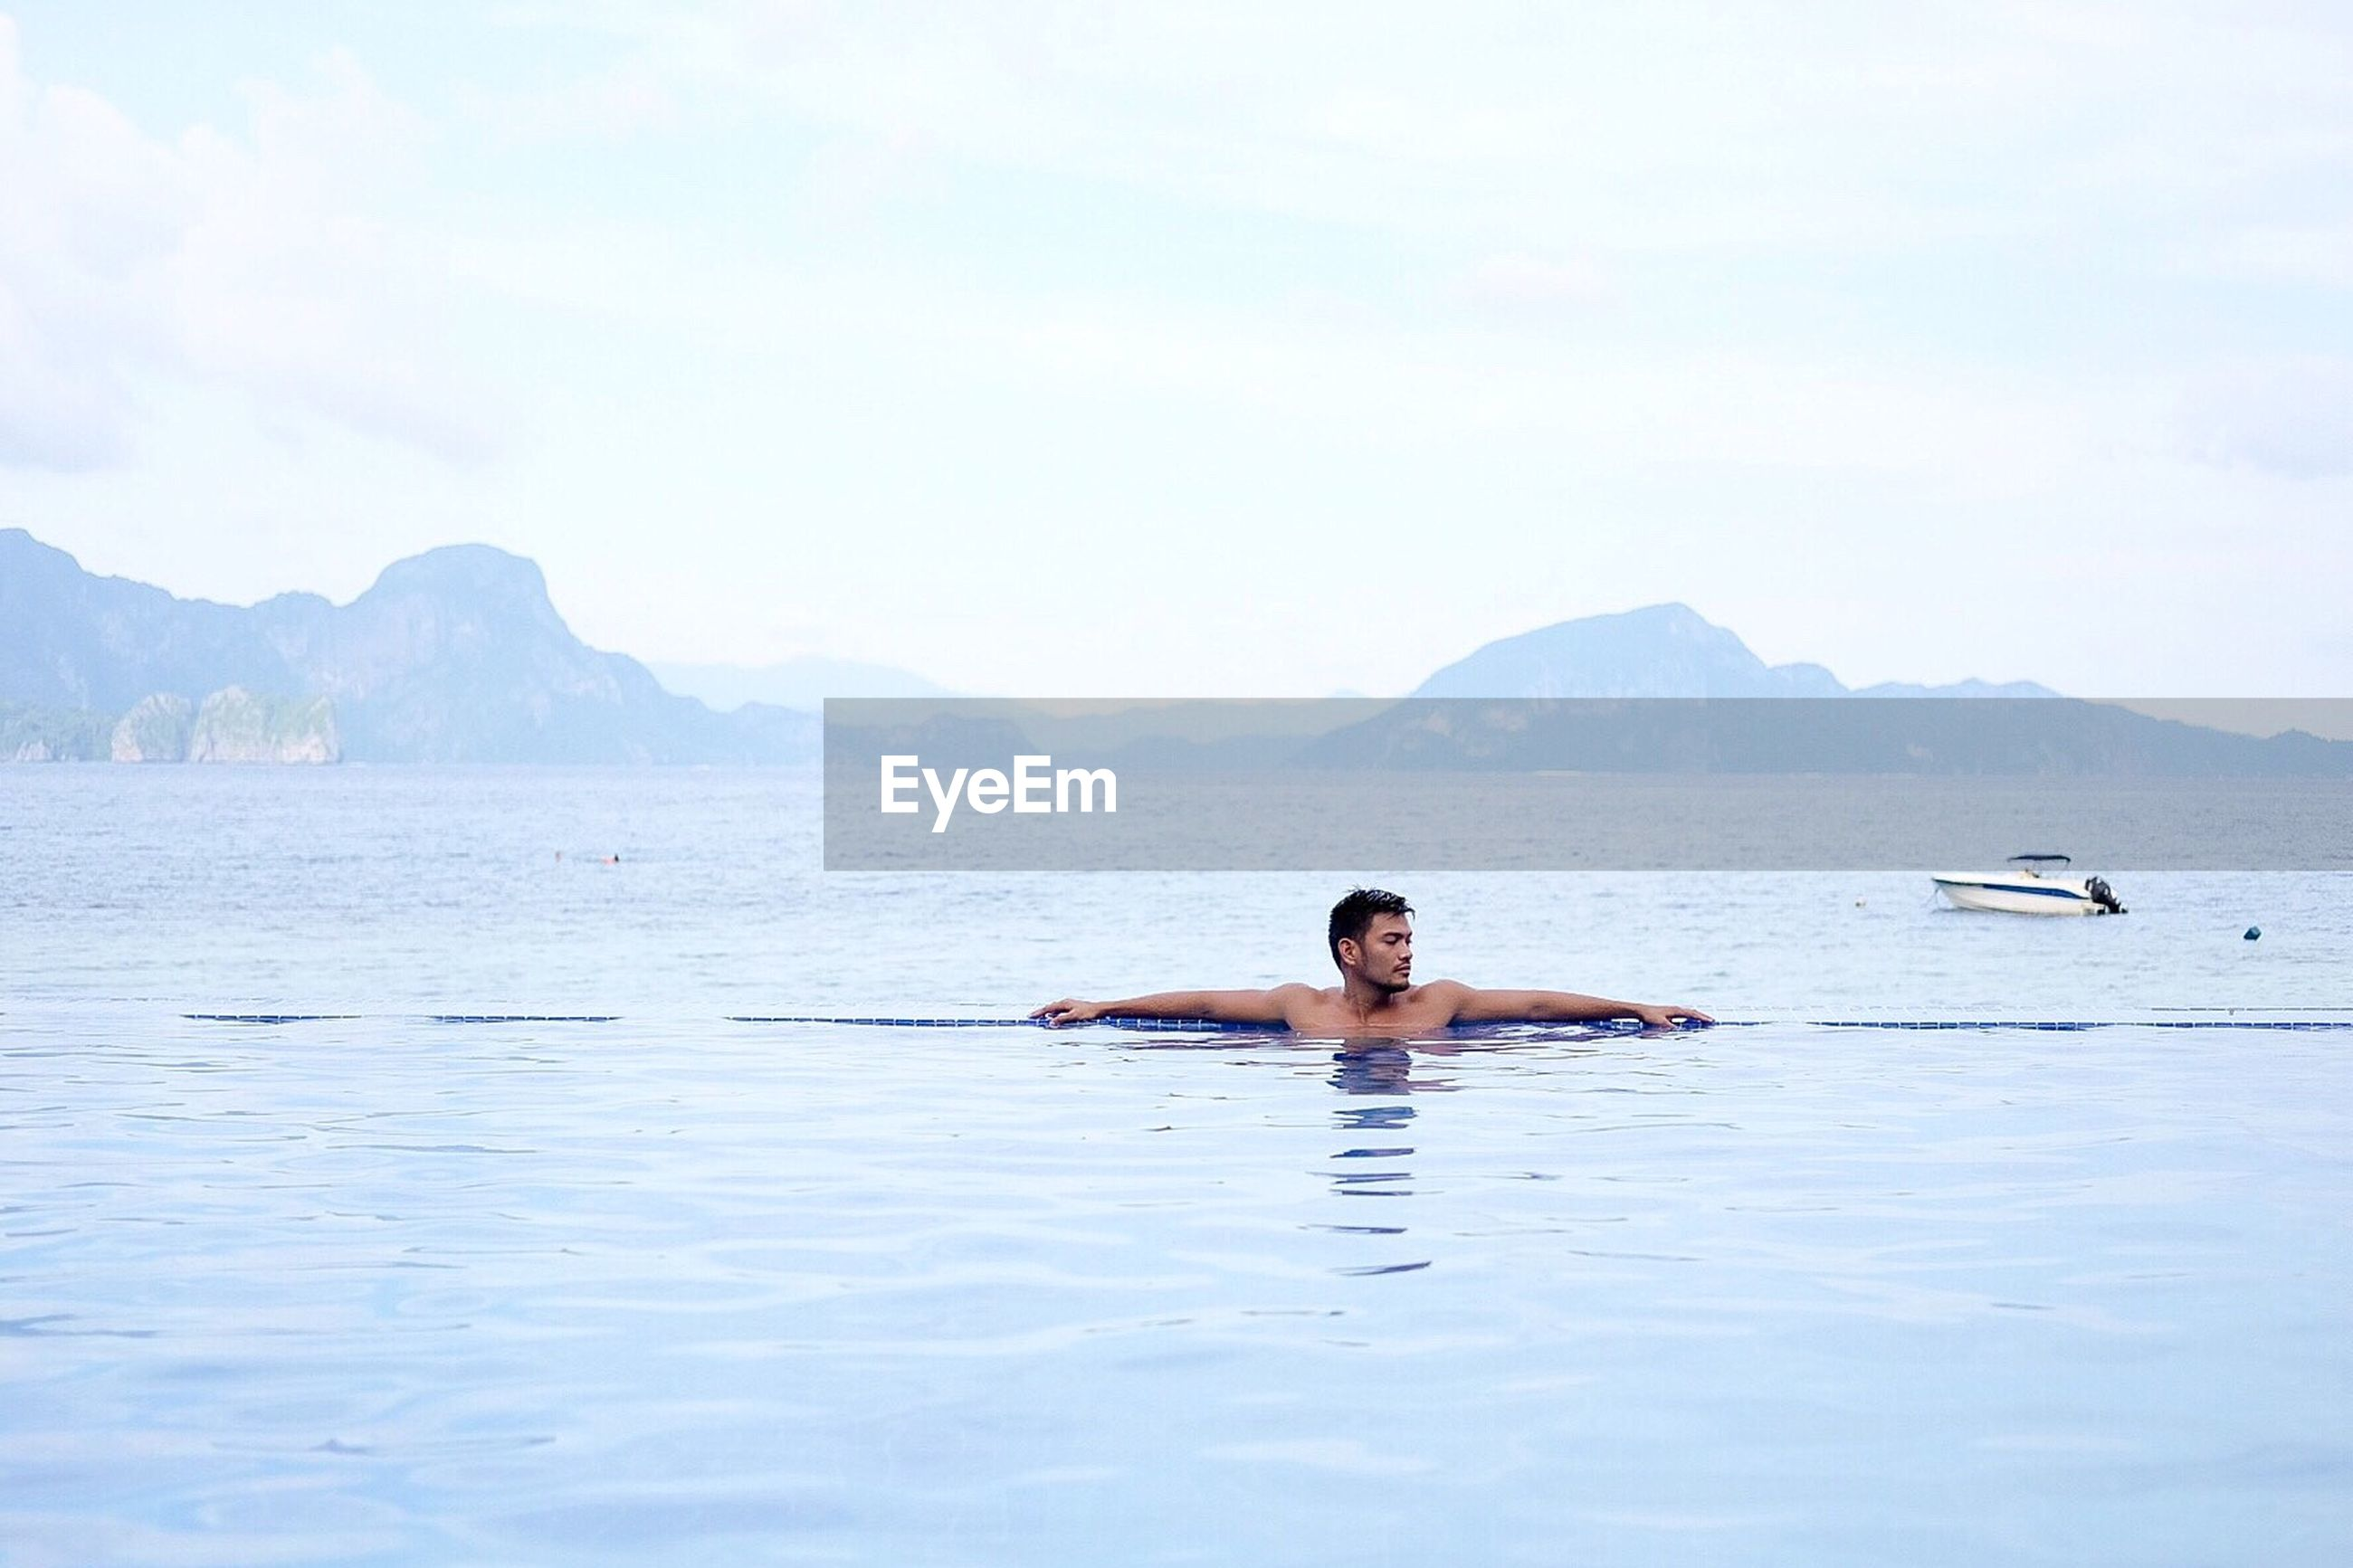 Man swimming in infinity pool by sea against sky